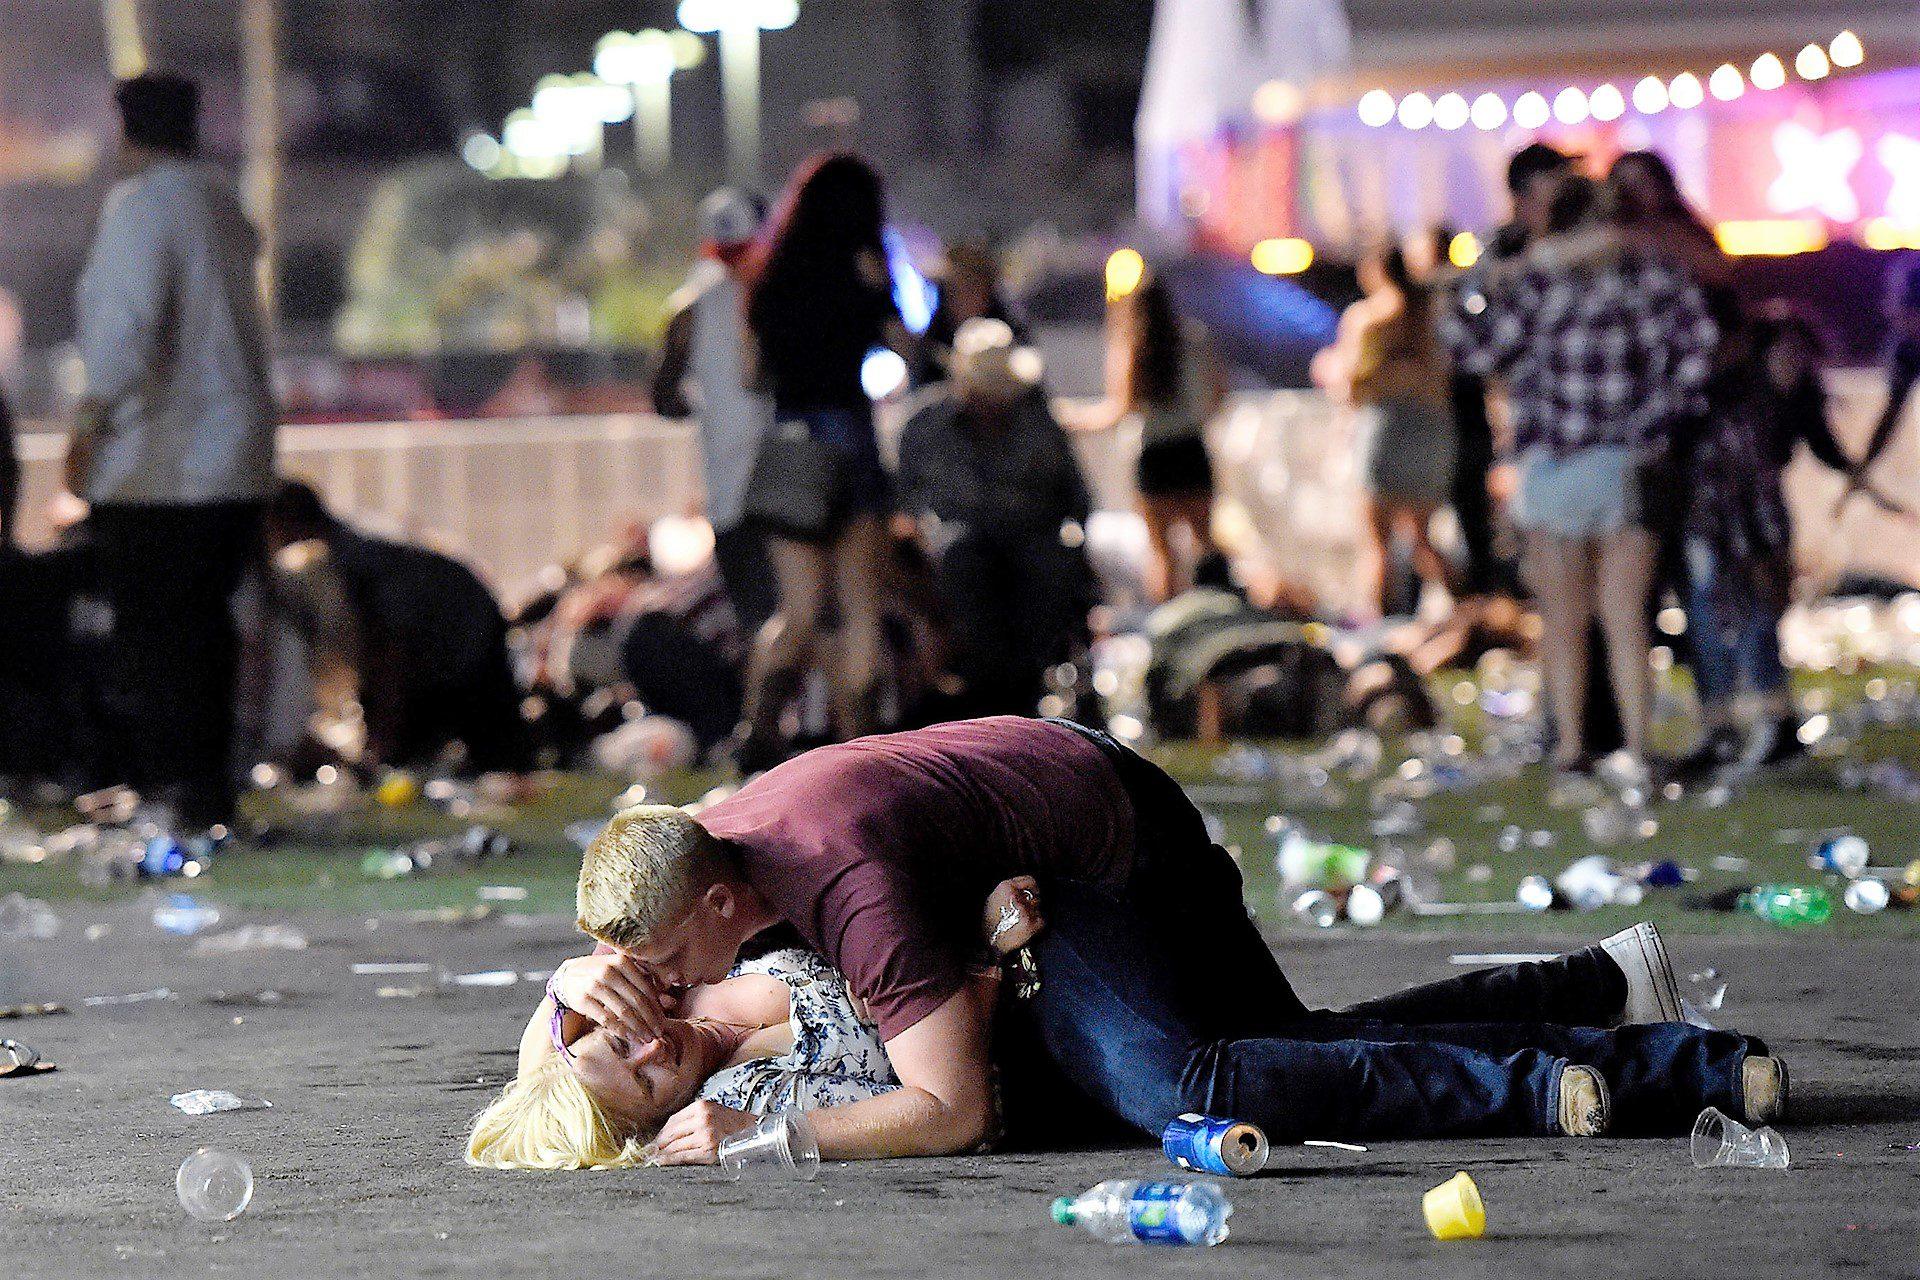 Matthew Cobos símbolo de esperanza en masacre de Las Vegas